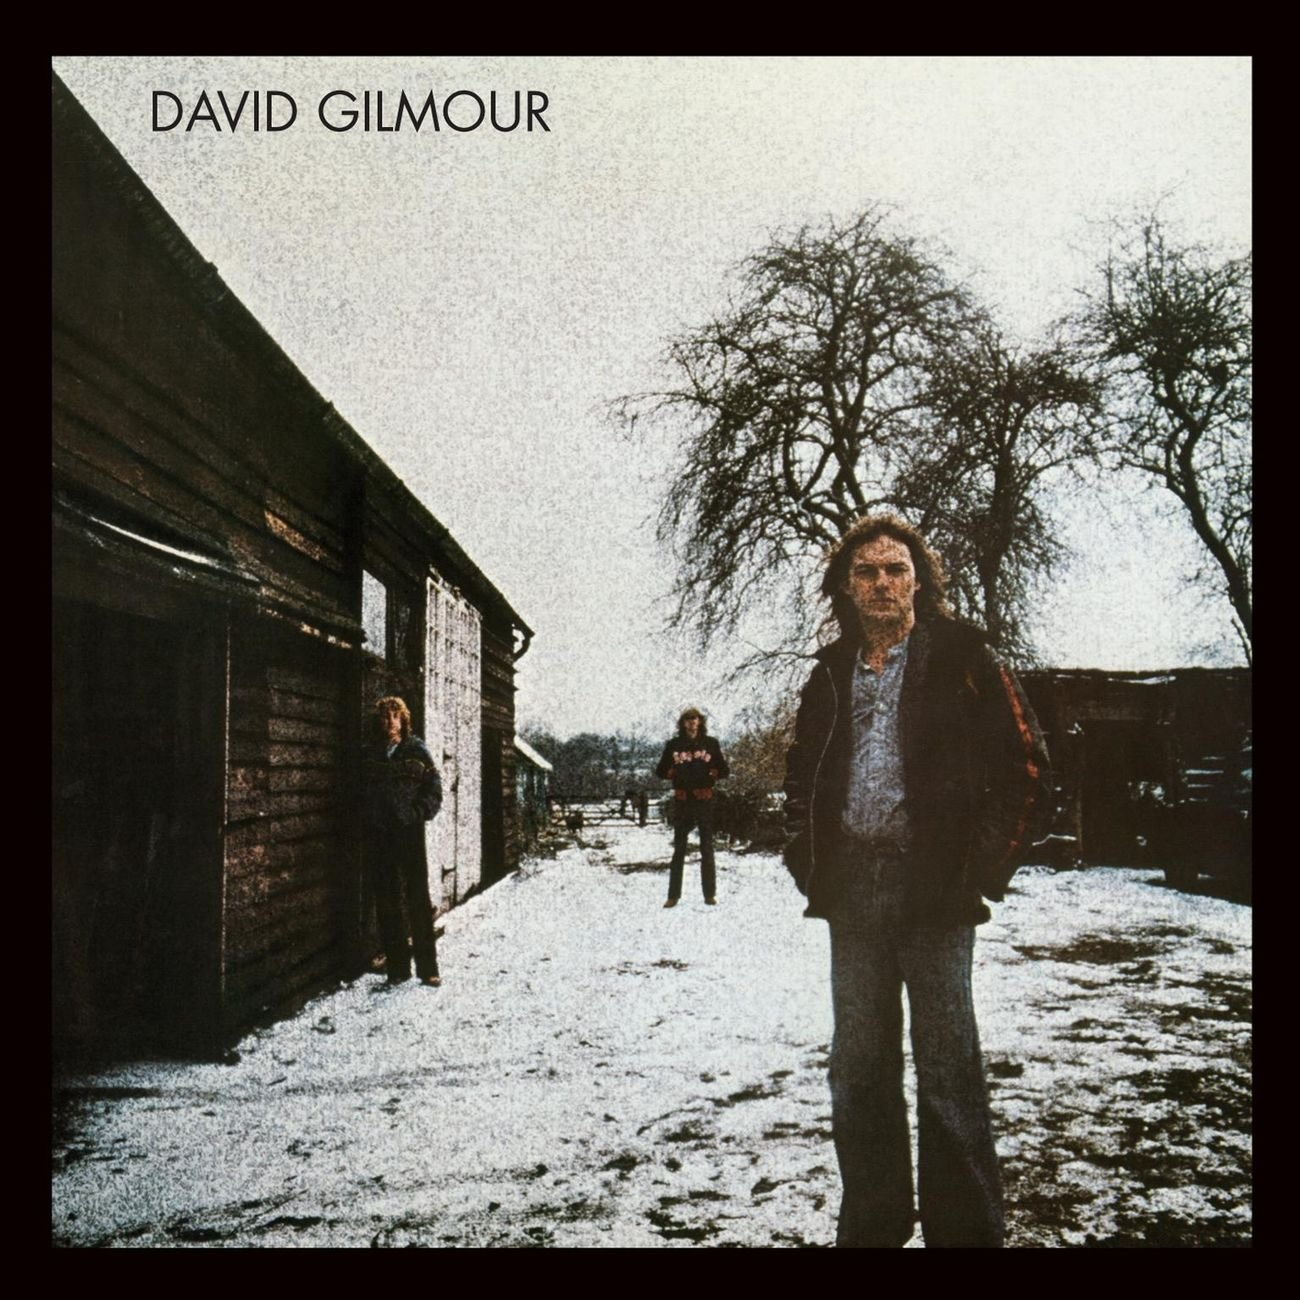 GILMOUR, DAVID - David Gilmour - Amazon.com Music